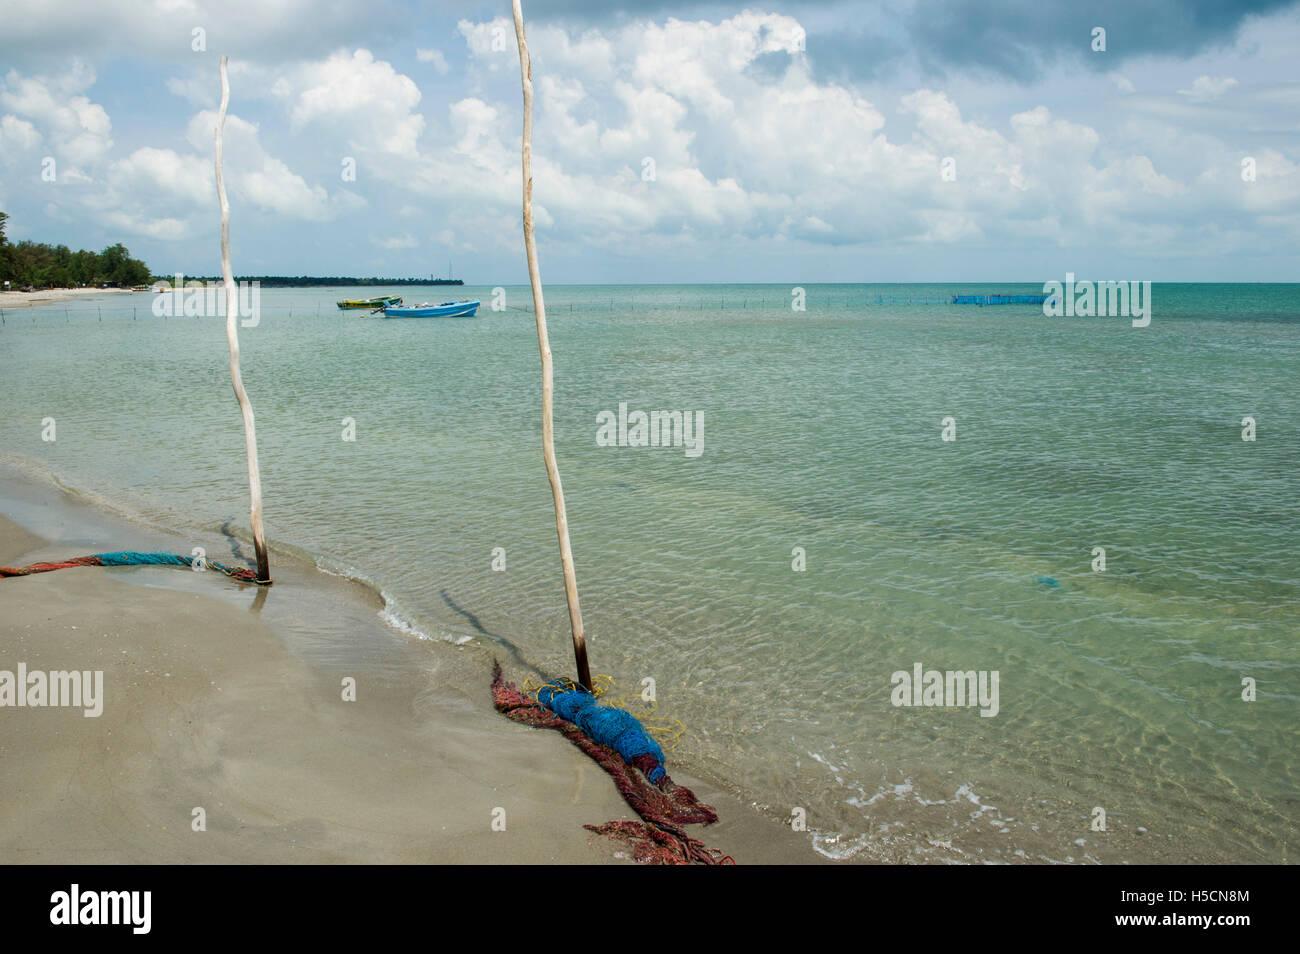 Boats on Casuarina beach, Karainagar, Jaffna Peninsula, Sri Lanka - Stock Image